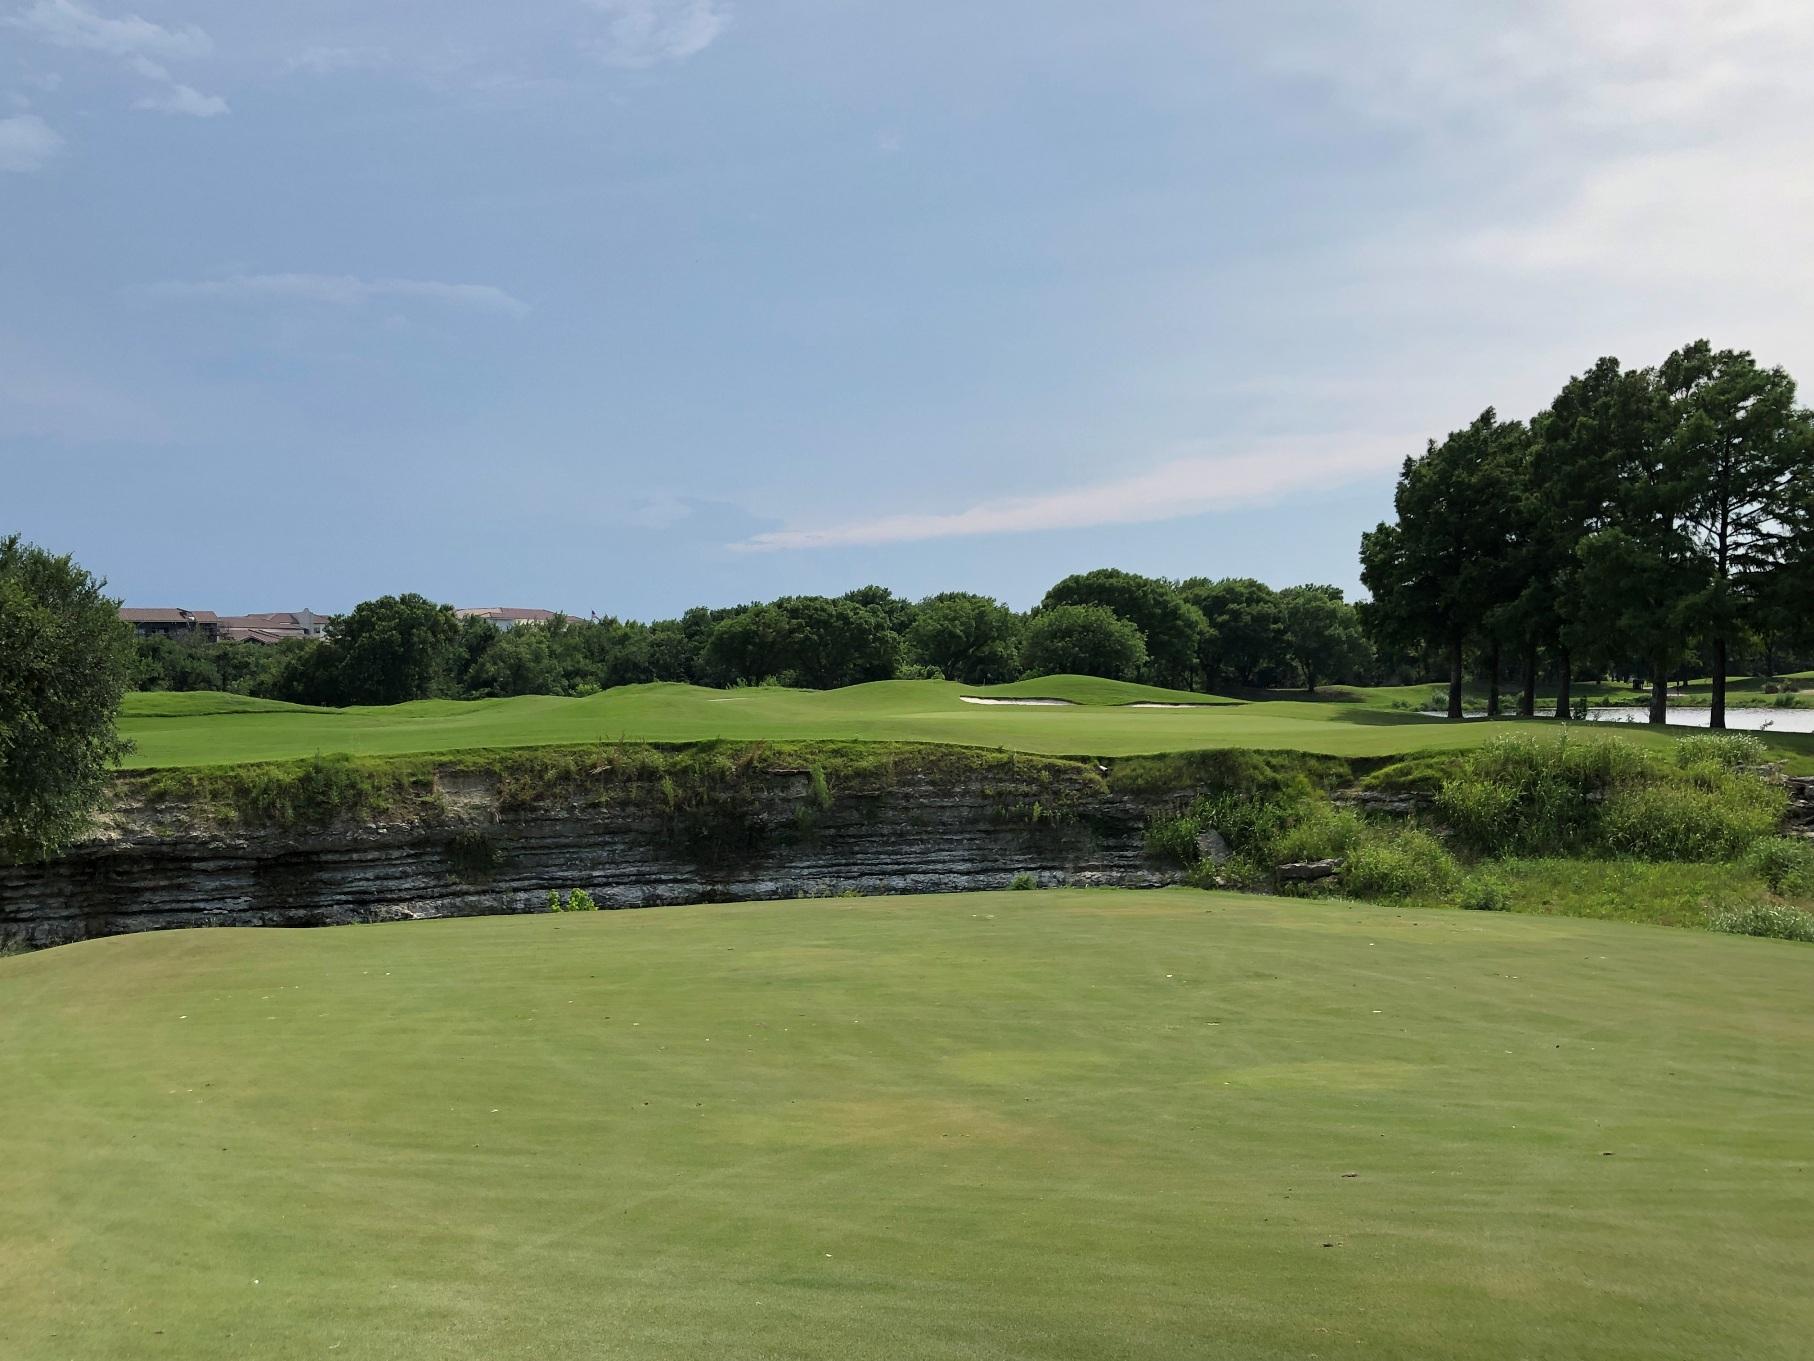 The Golf Club Fossil Creek (Fort Worth, TX on 06/09/19 ...